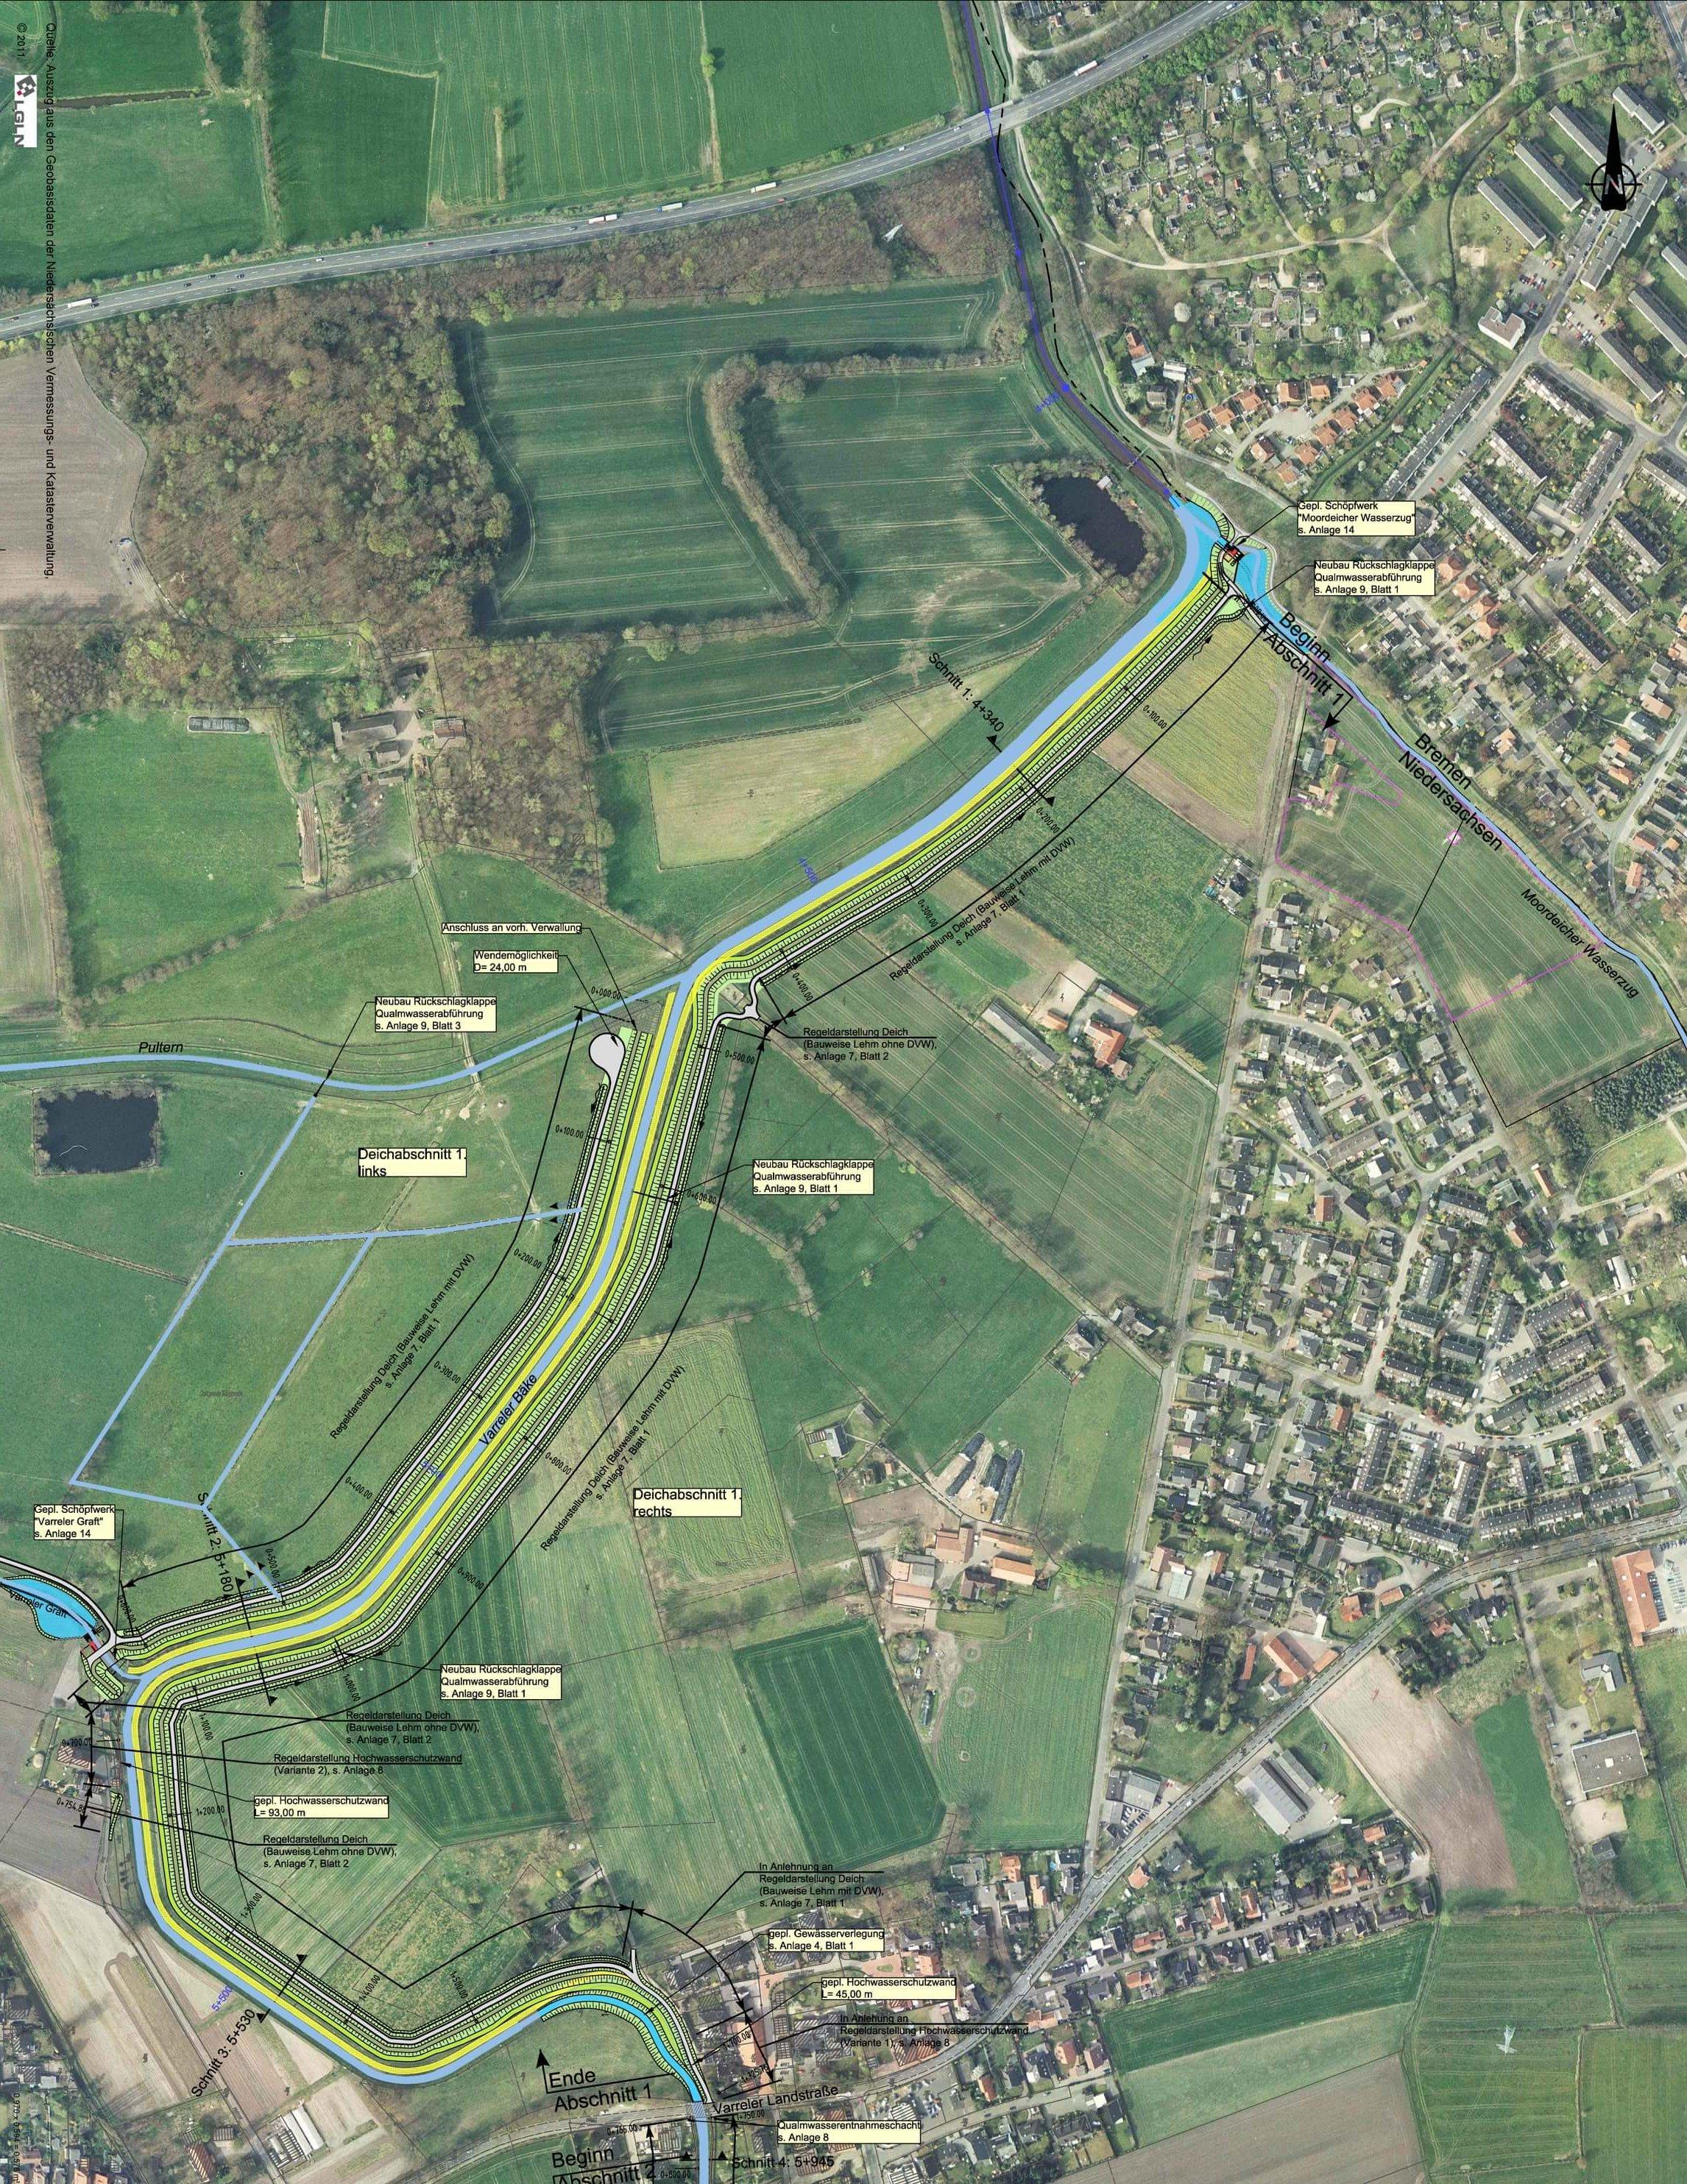 Hochwasserschutzplanung am Klosterbach/Varreler Bäke IDN-Projekt 5088